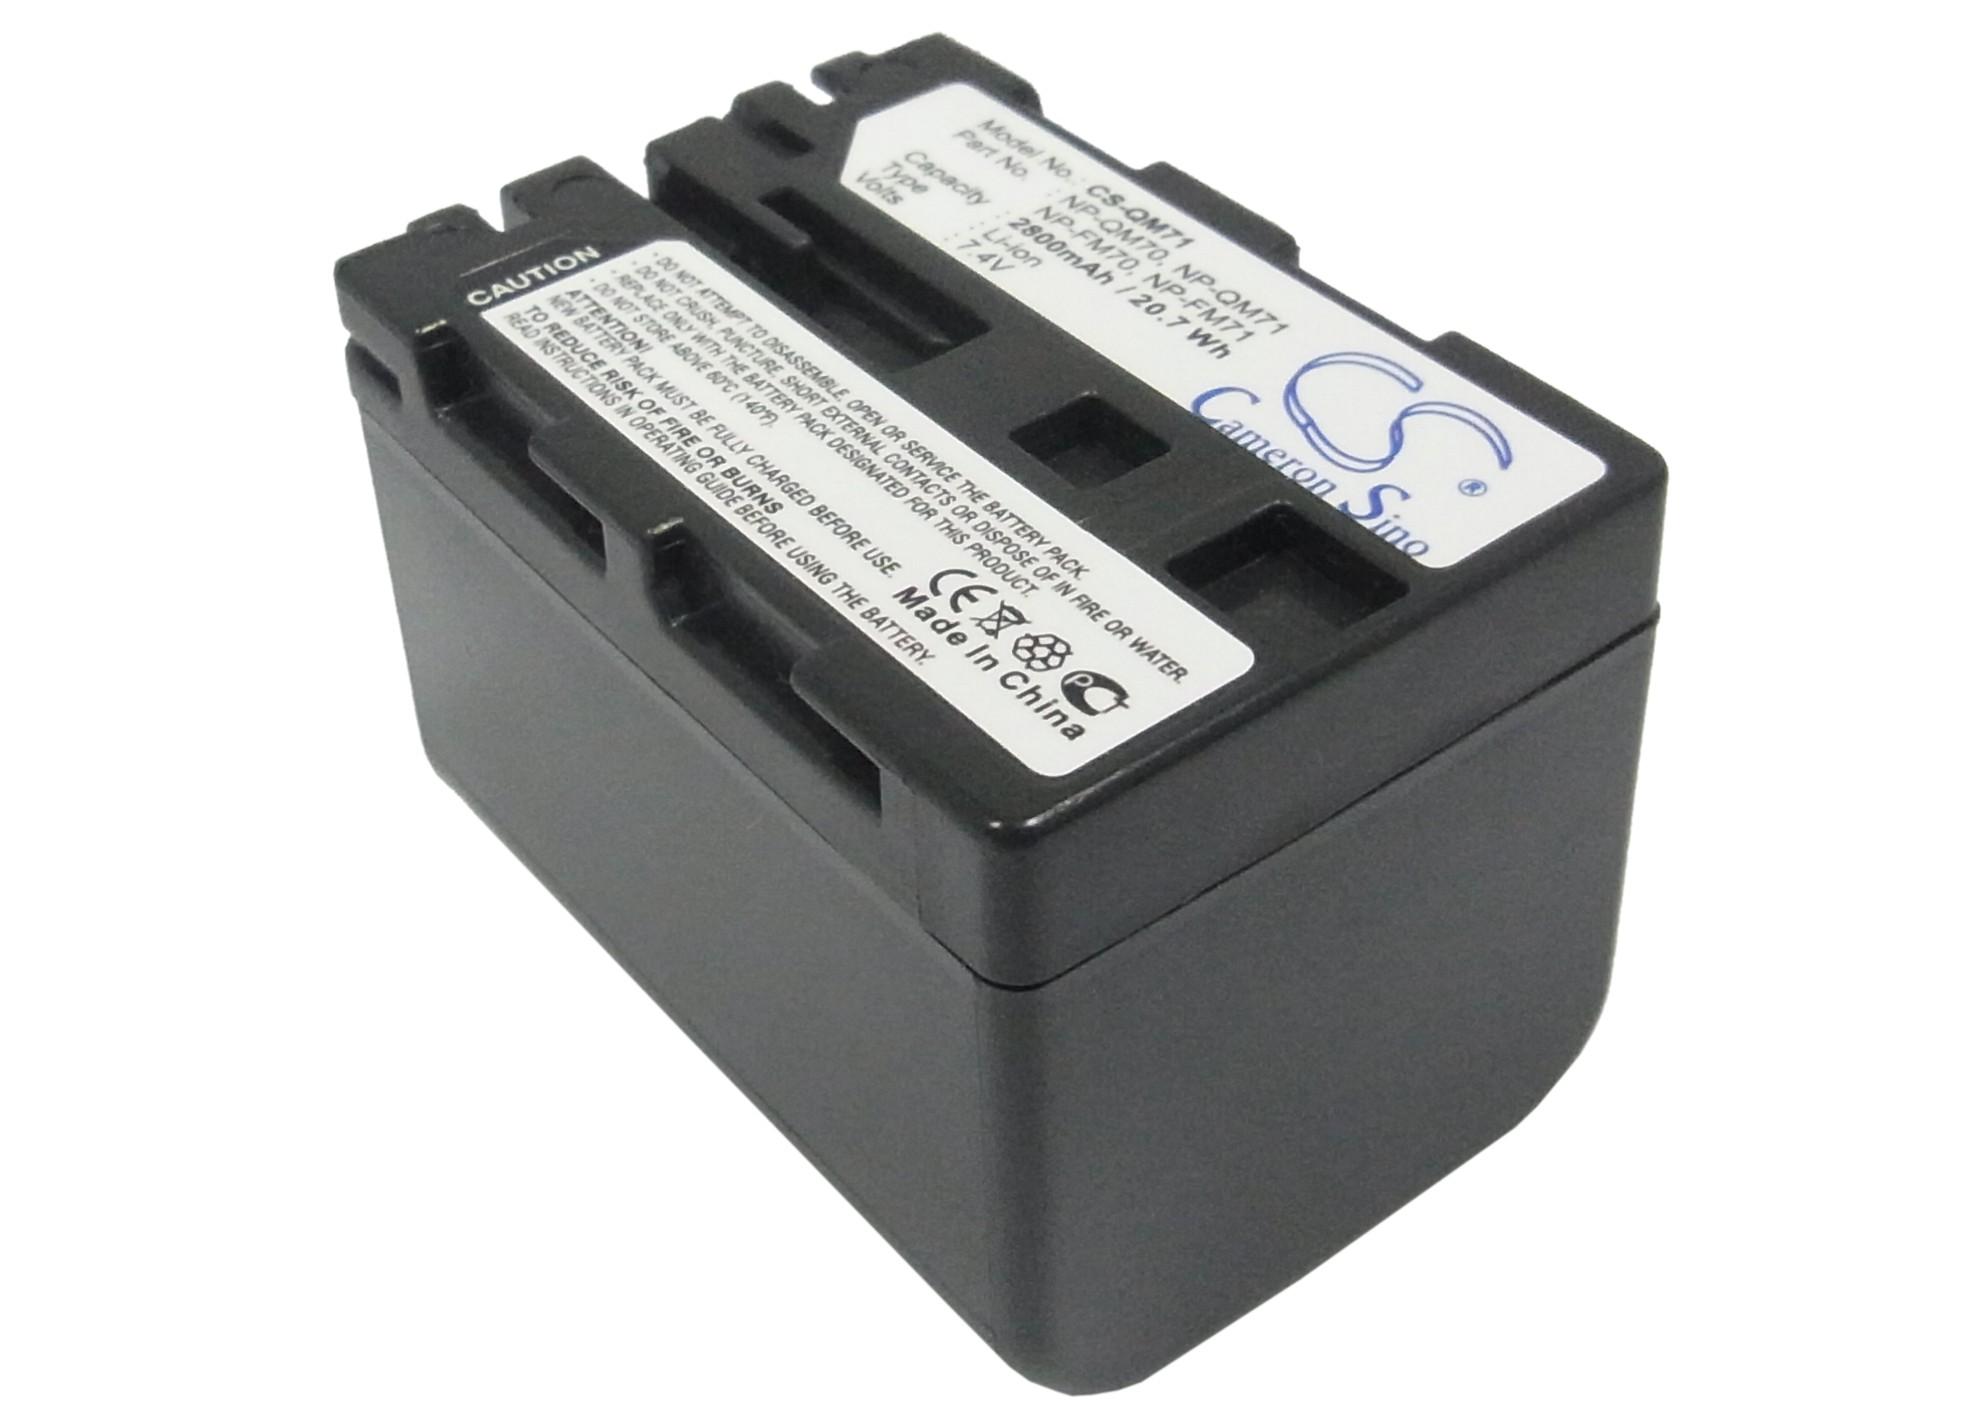 Cameron Sino baterie do kamer a fotoaparátů pro SONY DCR-DVD201 7.4V Li-ion 2800mAh tmavě šedá - neoriginální